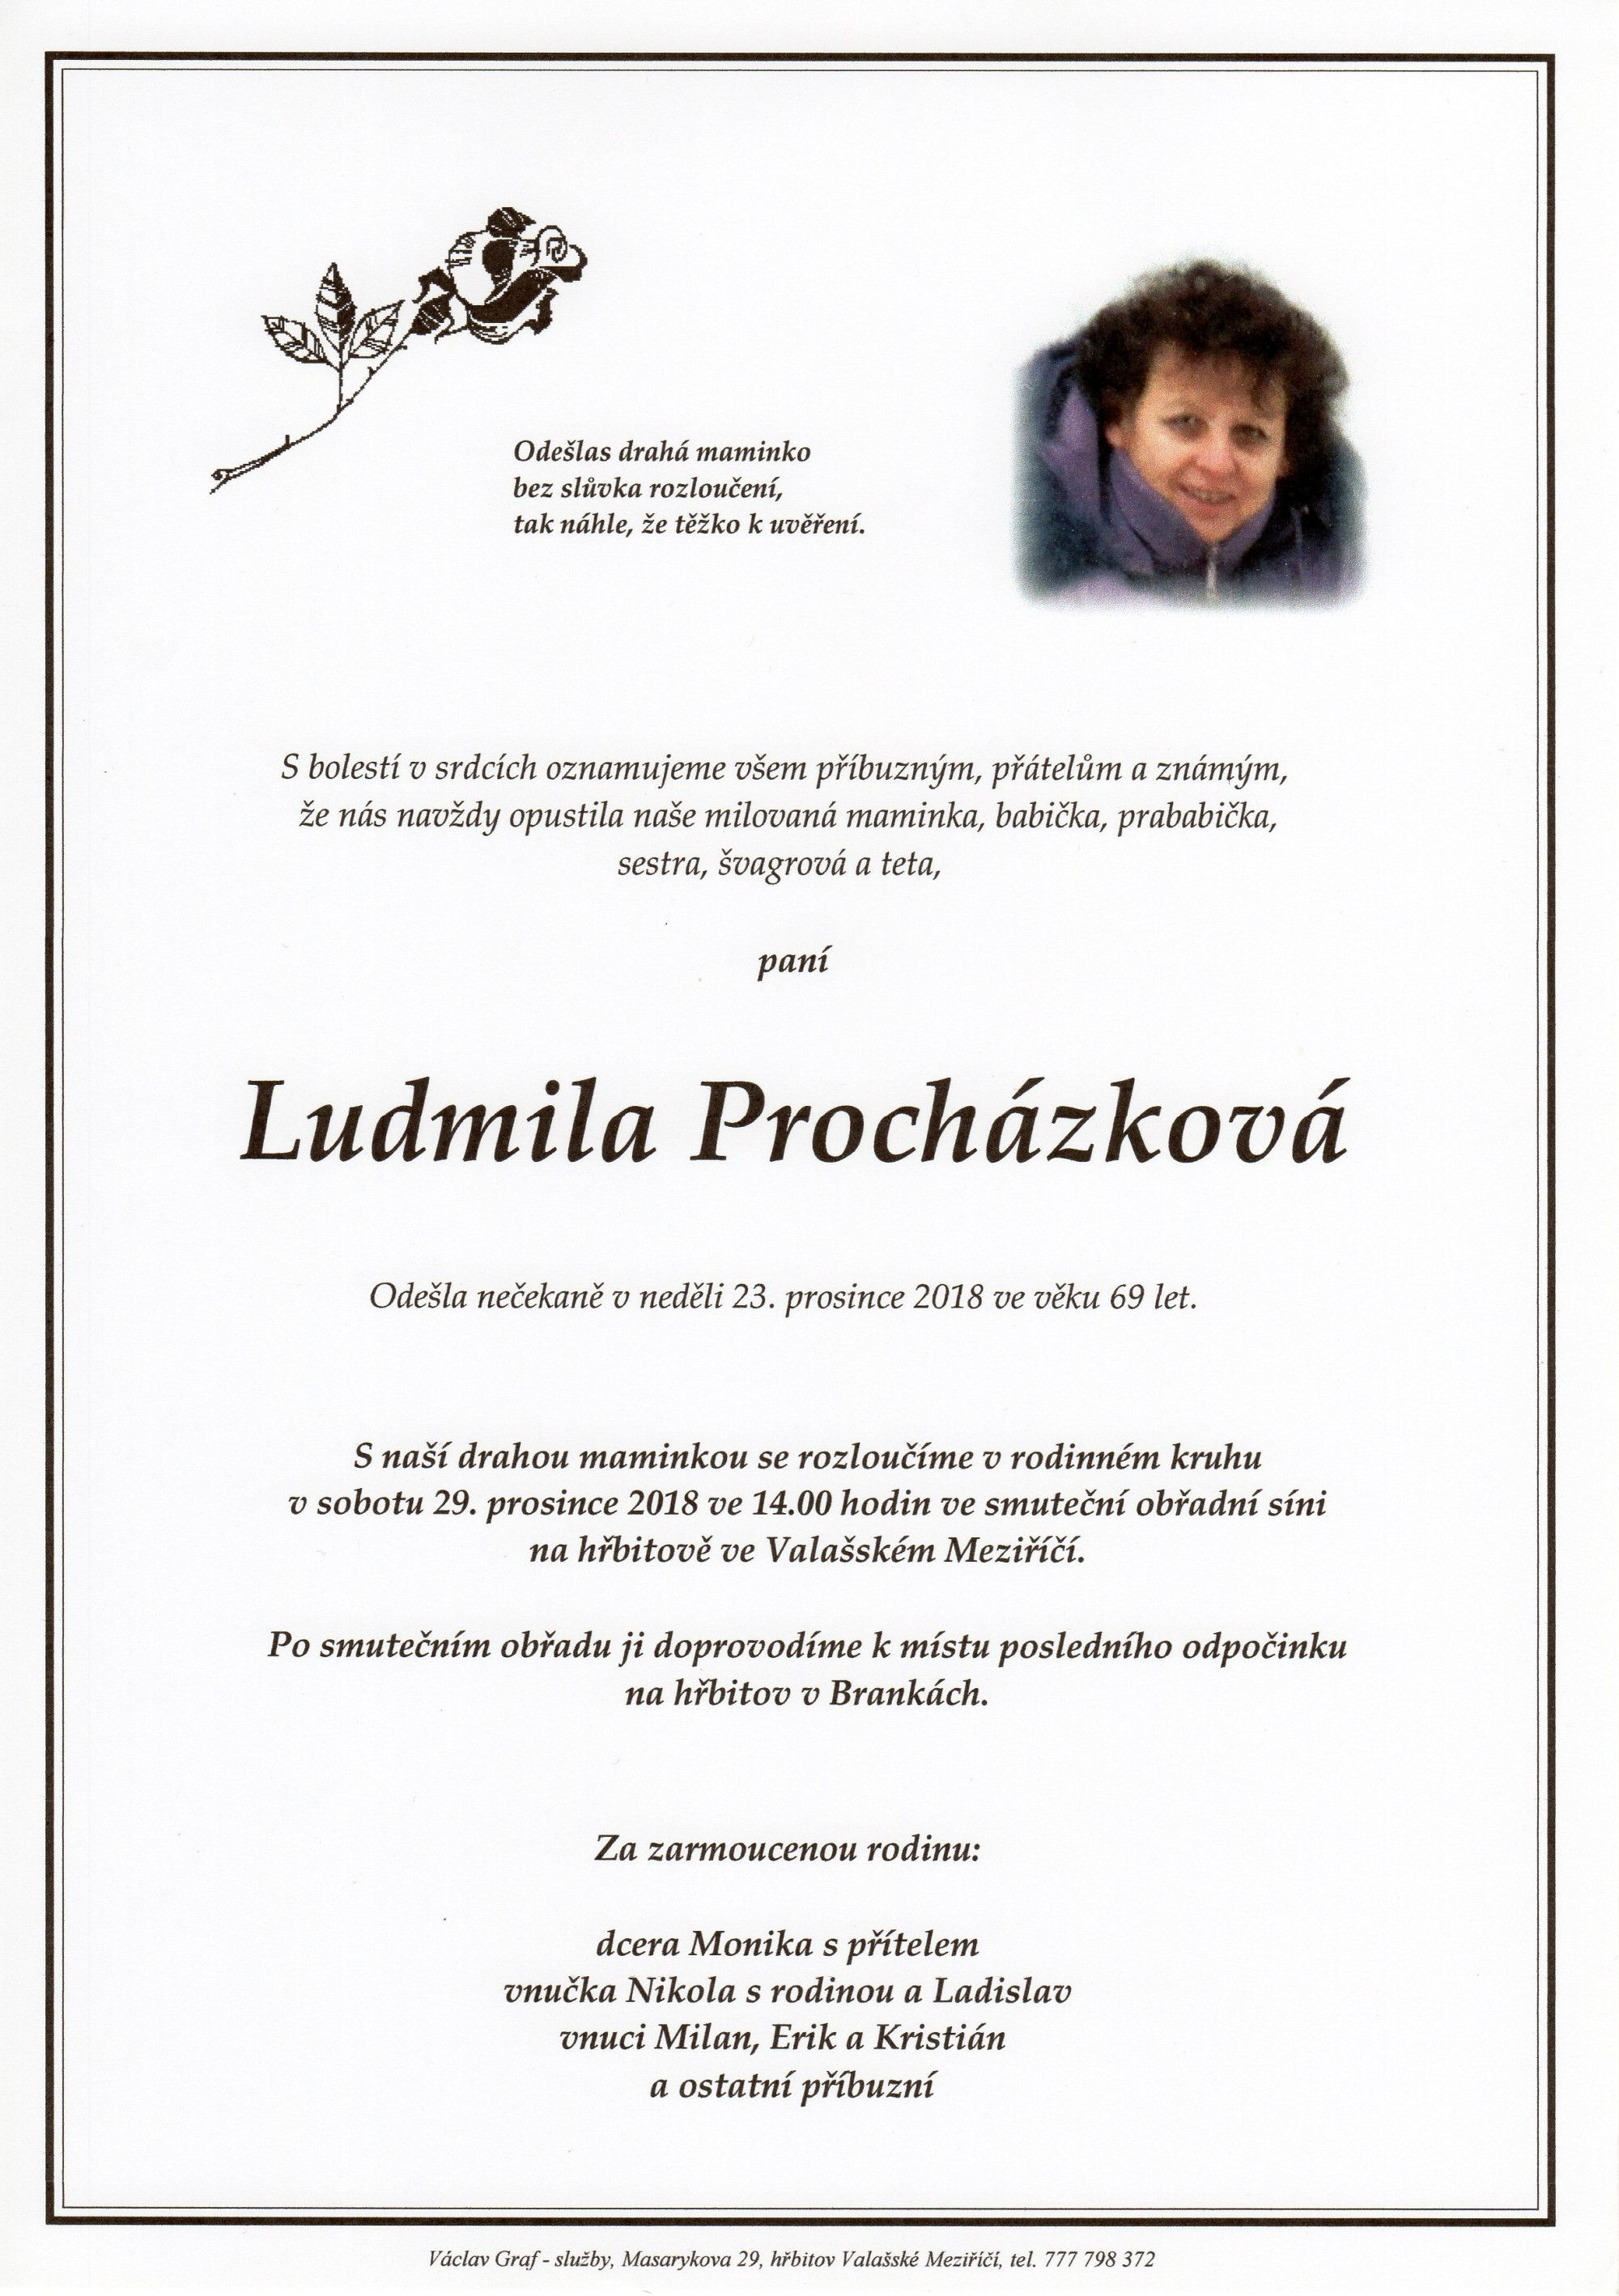 Ludmila Procházková